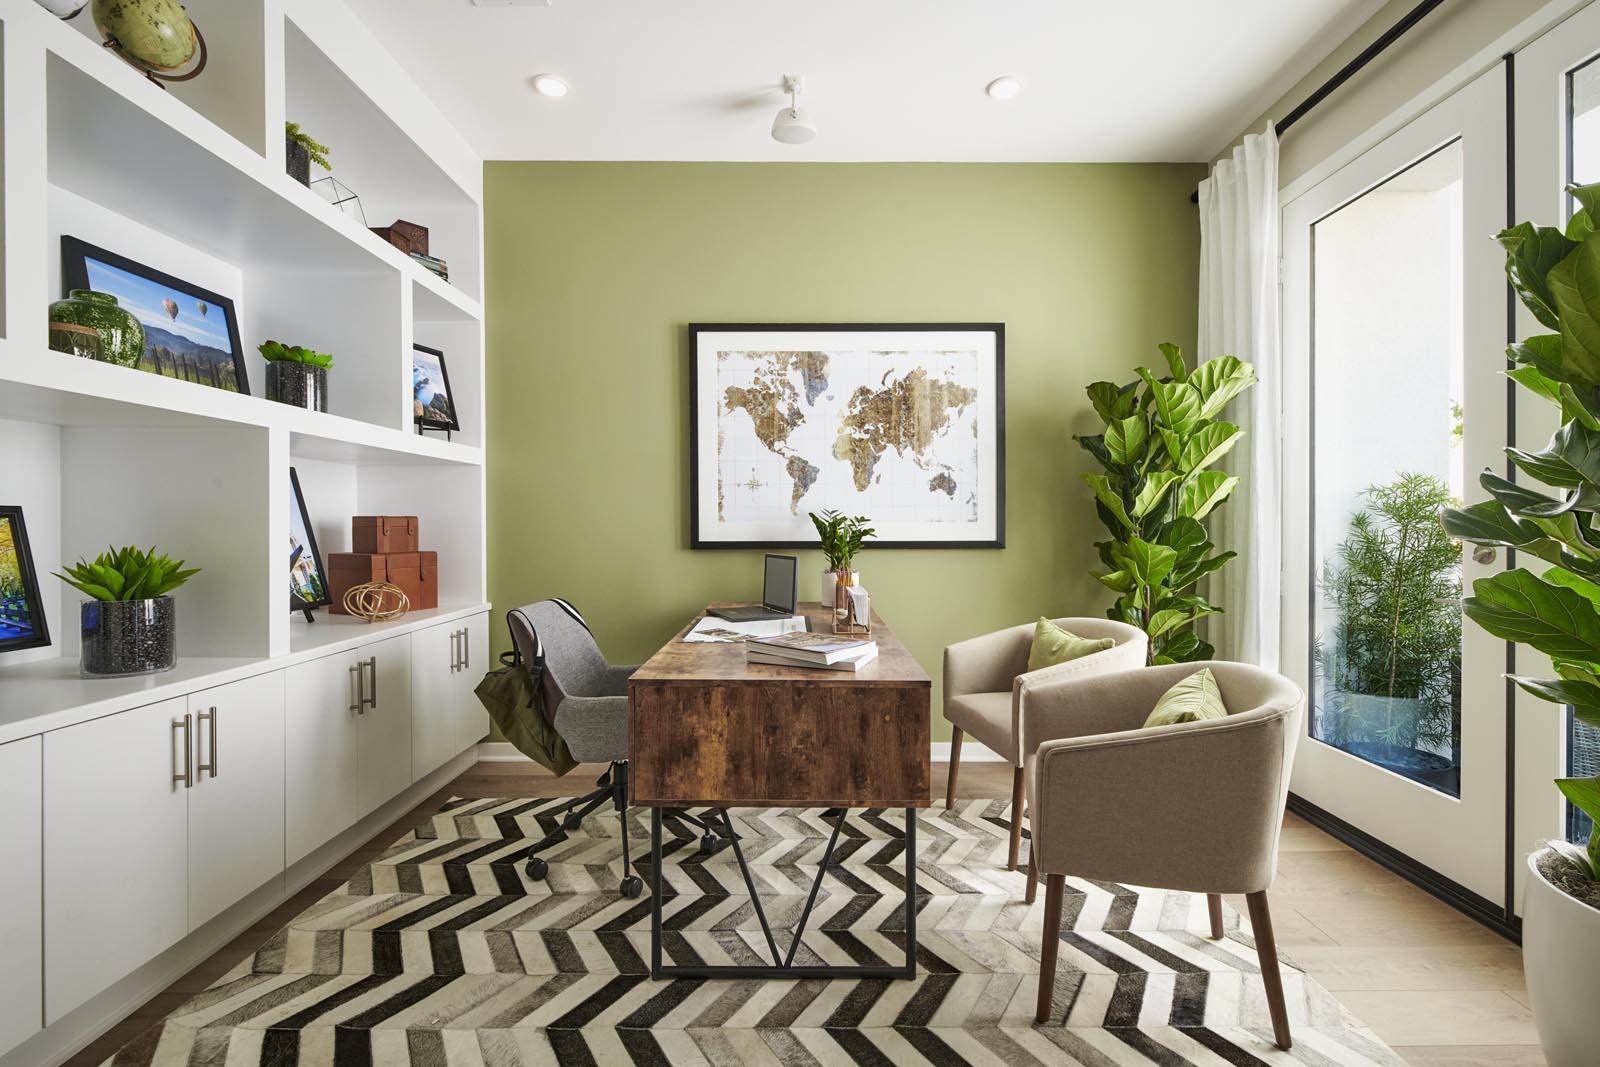 Den   Residence 3   Enliven   New Homes in Rancho Cucamonga, CA   Van Daele Homes